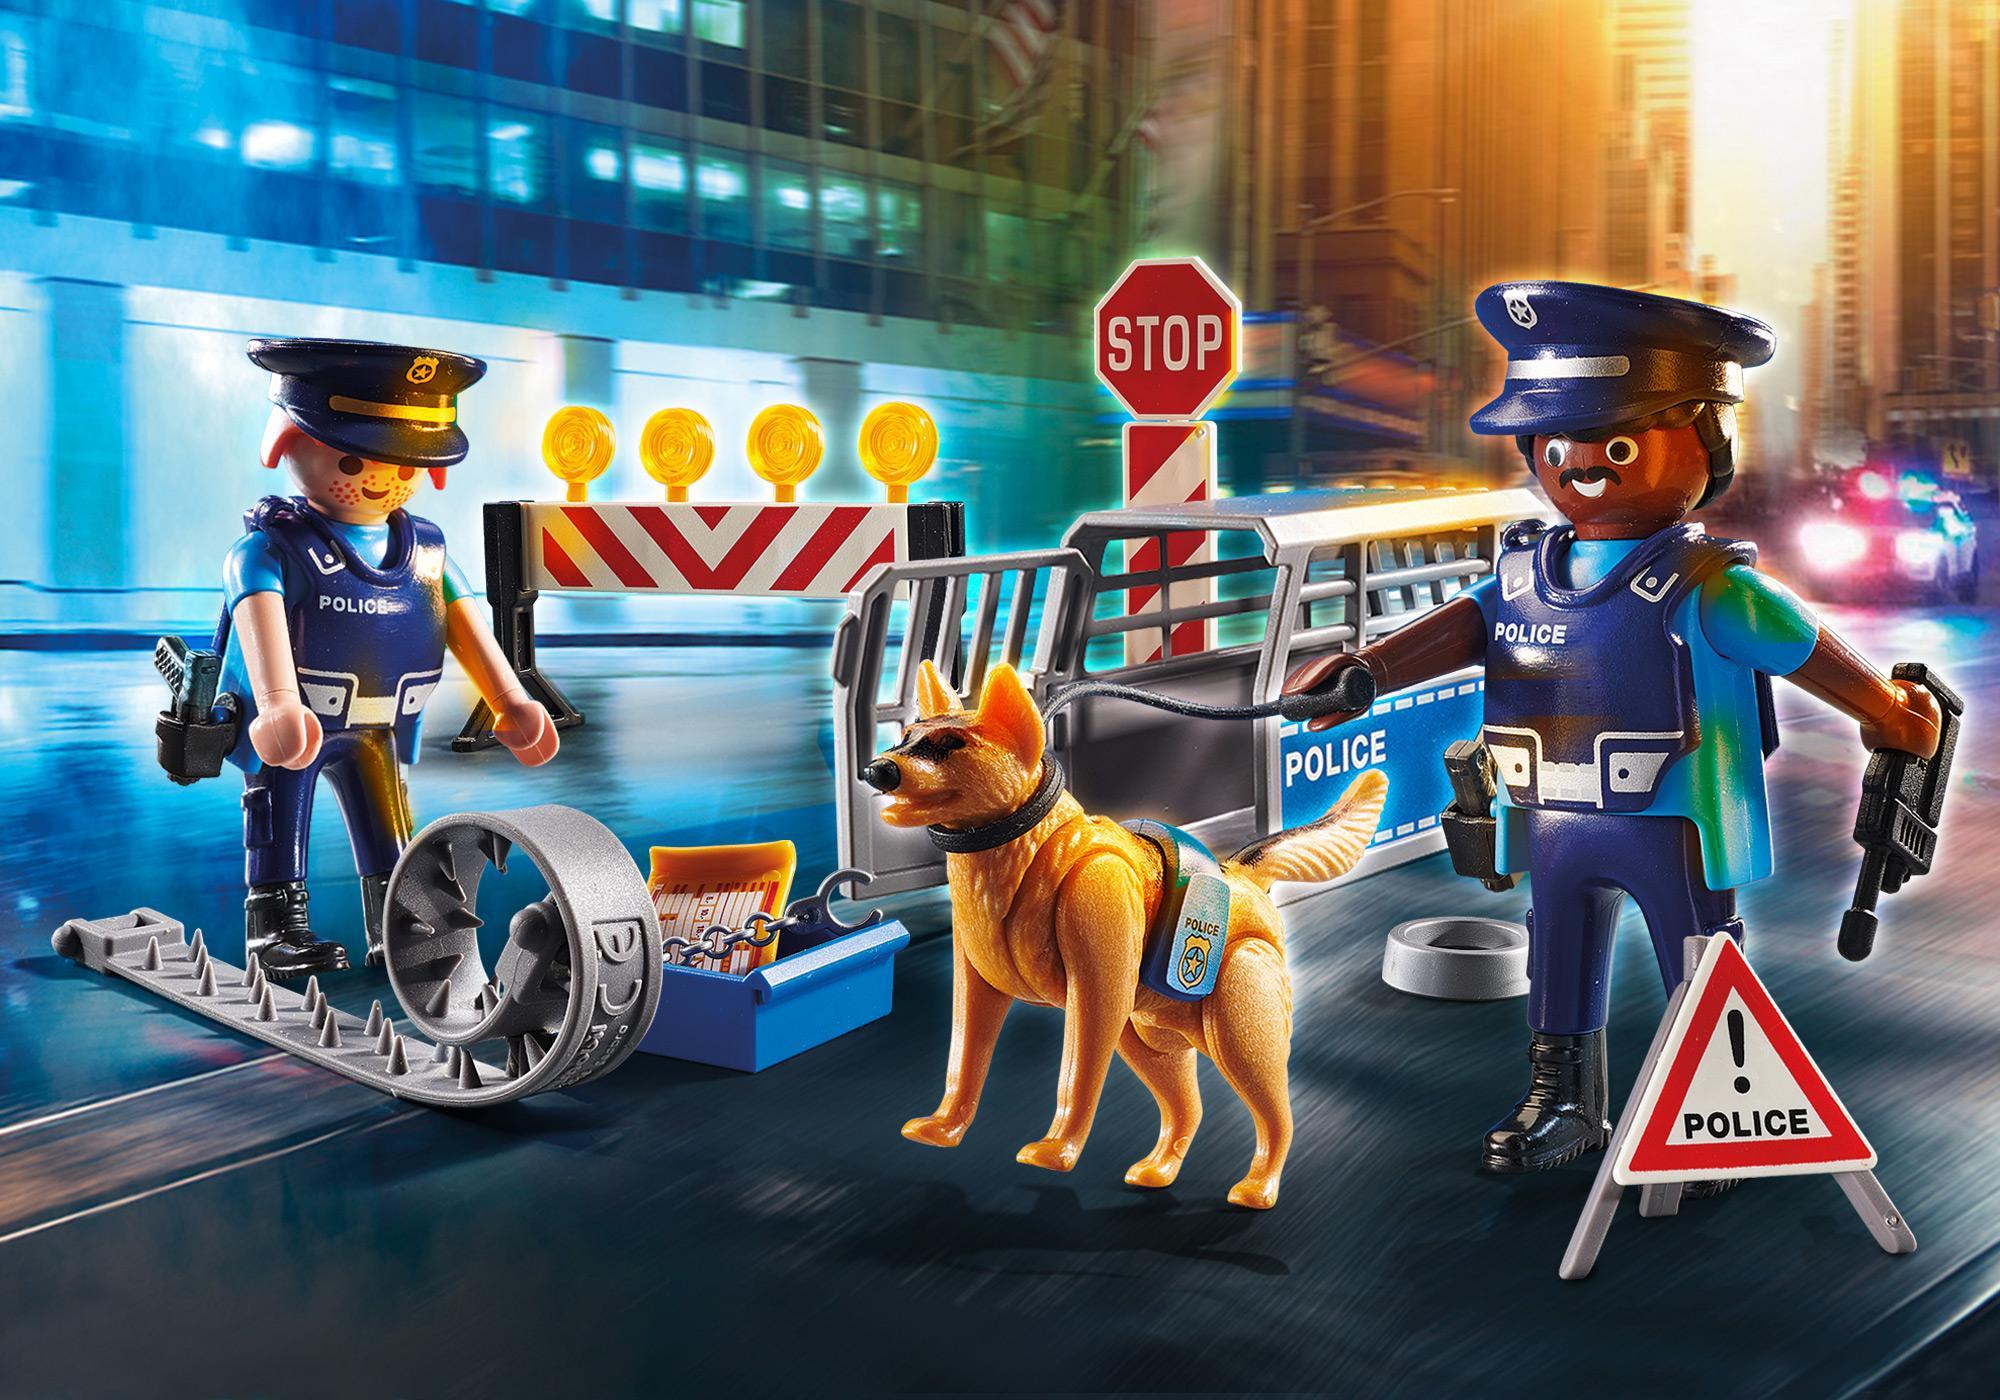 6924_product_detail/Police Roadblock